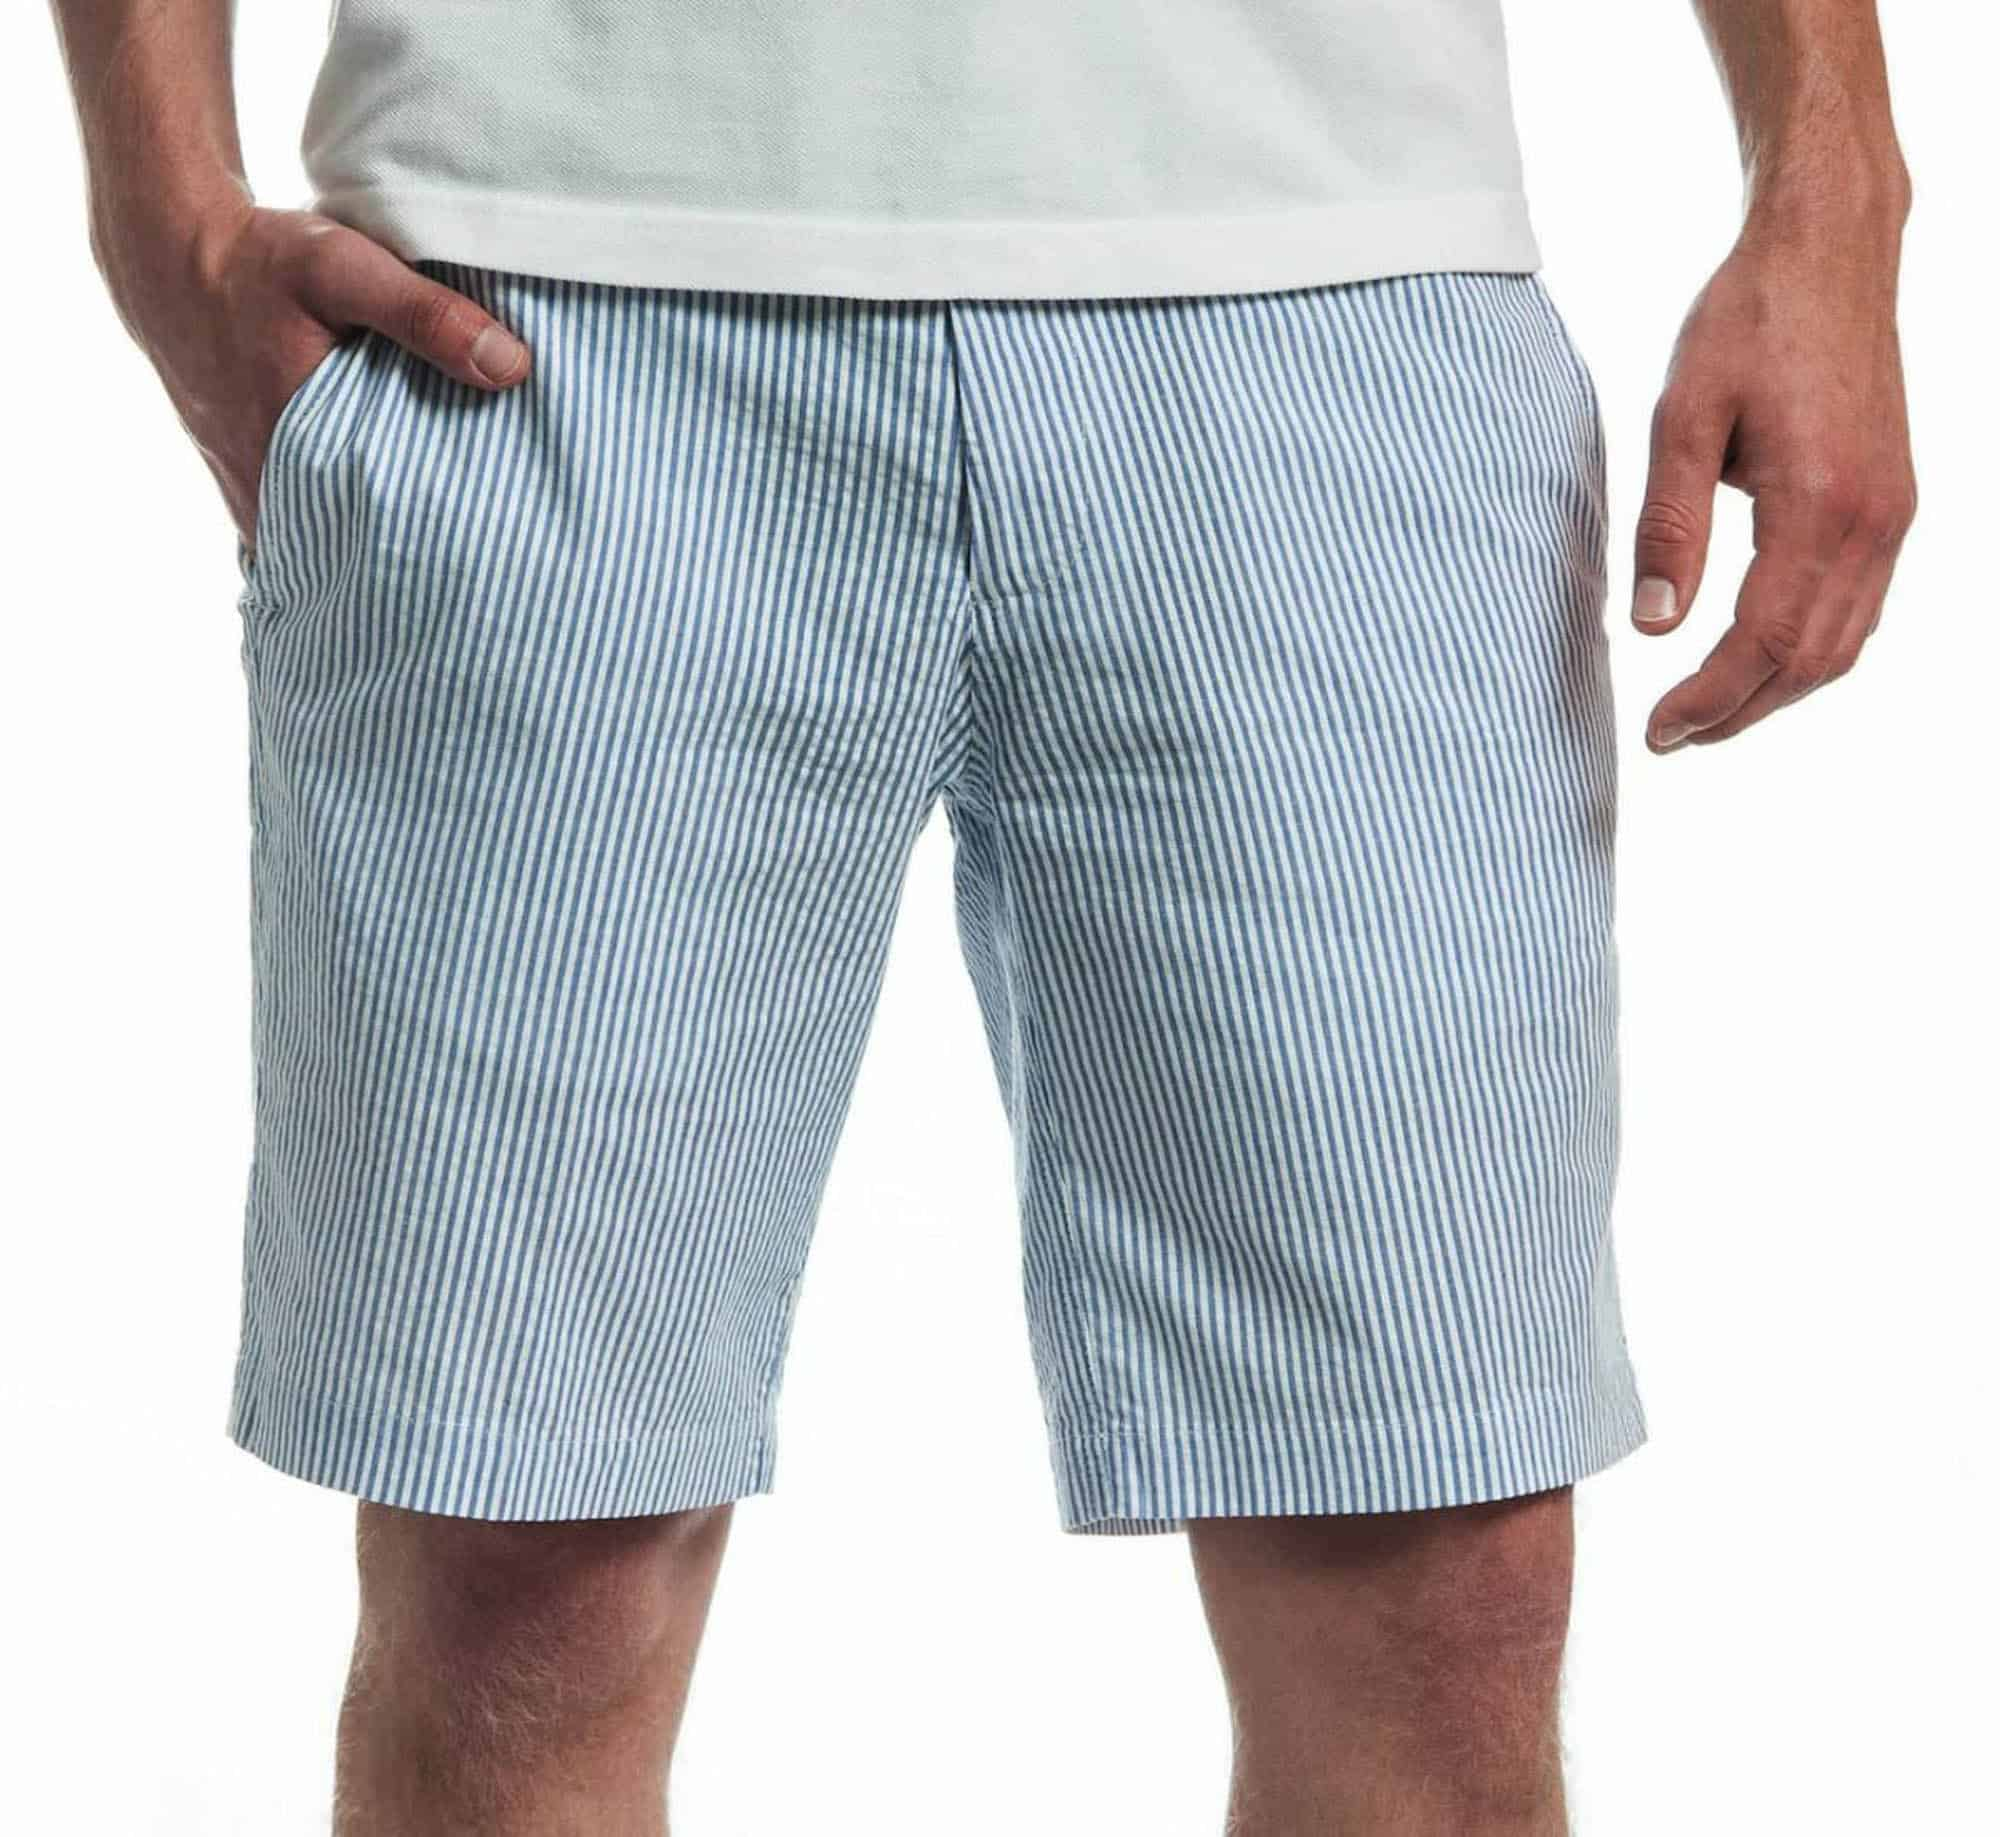 Very short shorts for women